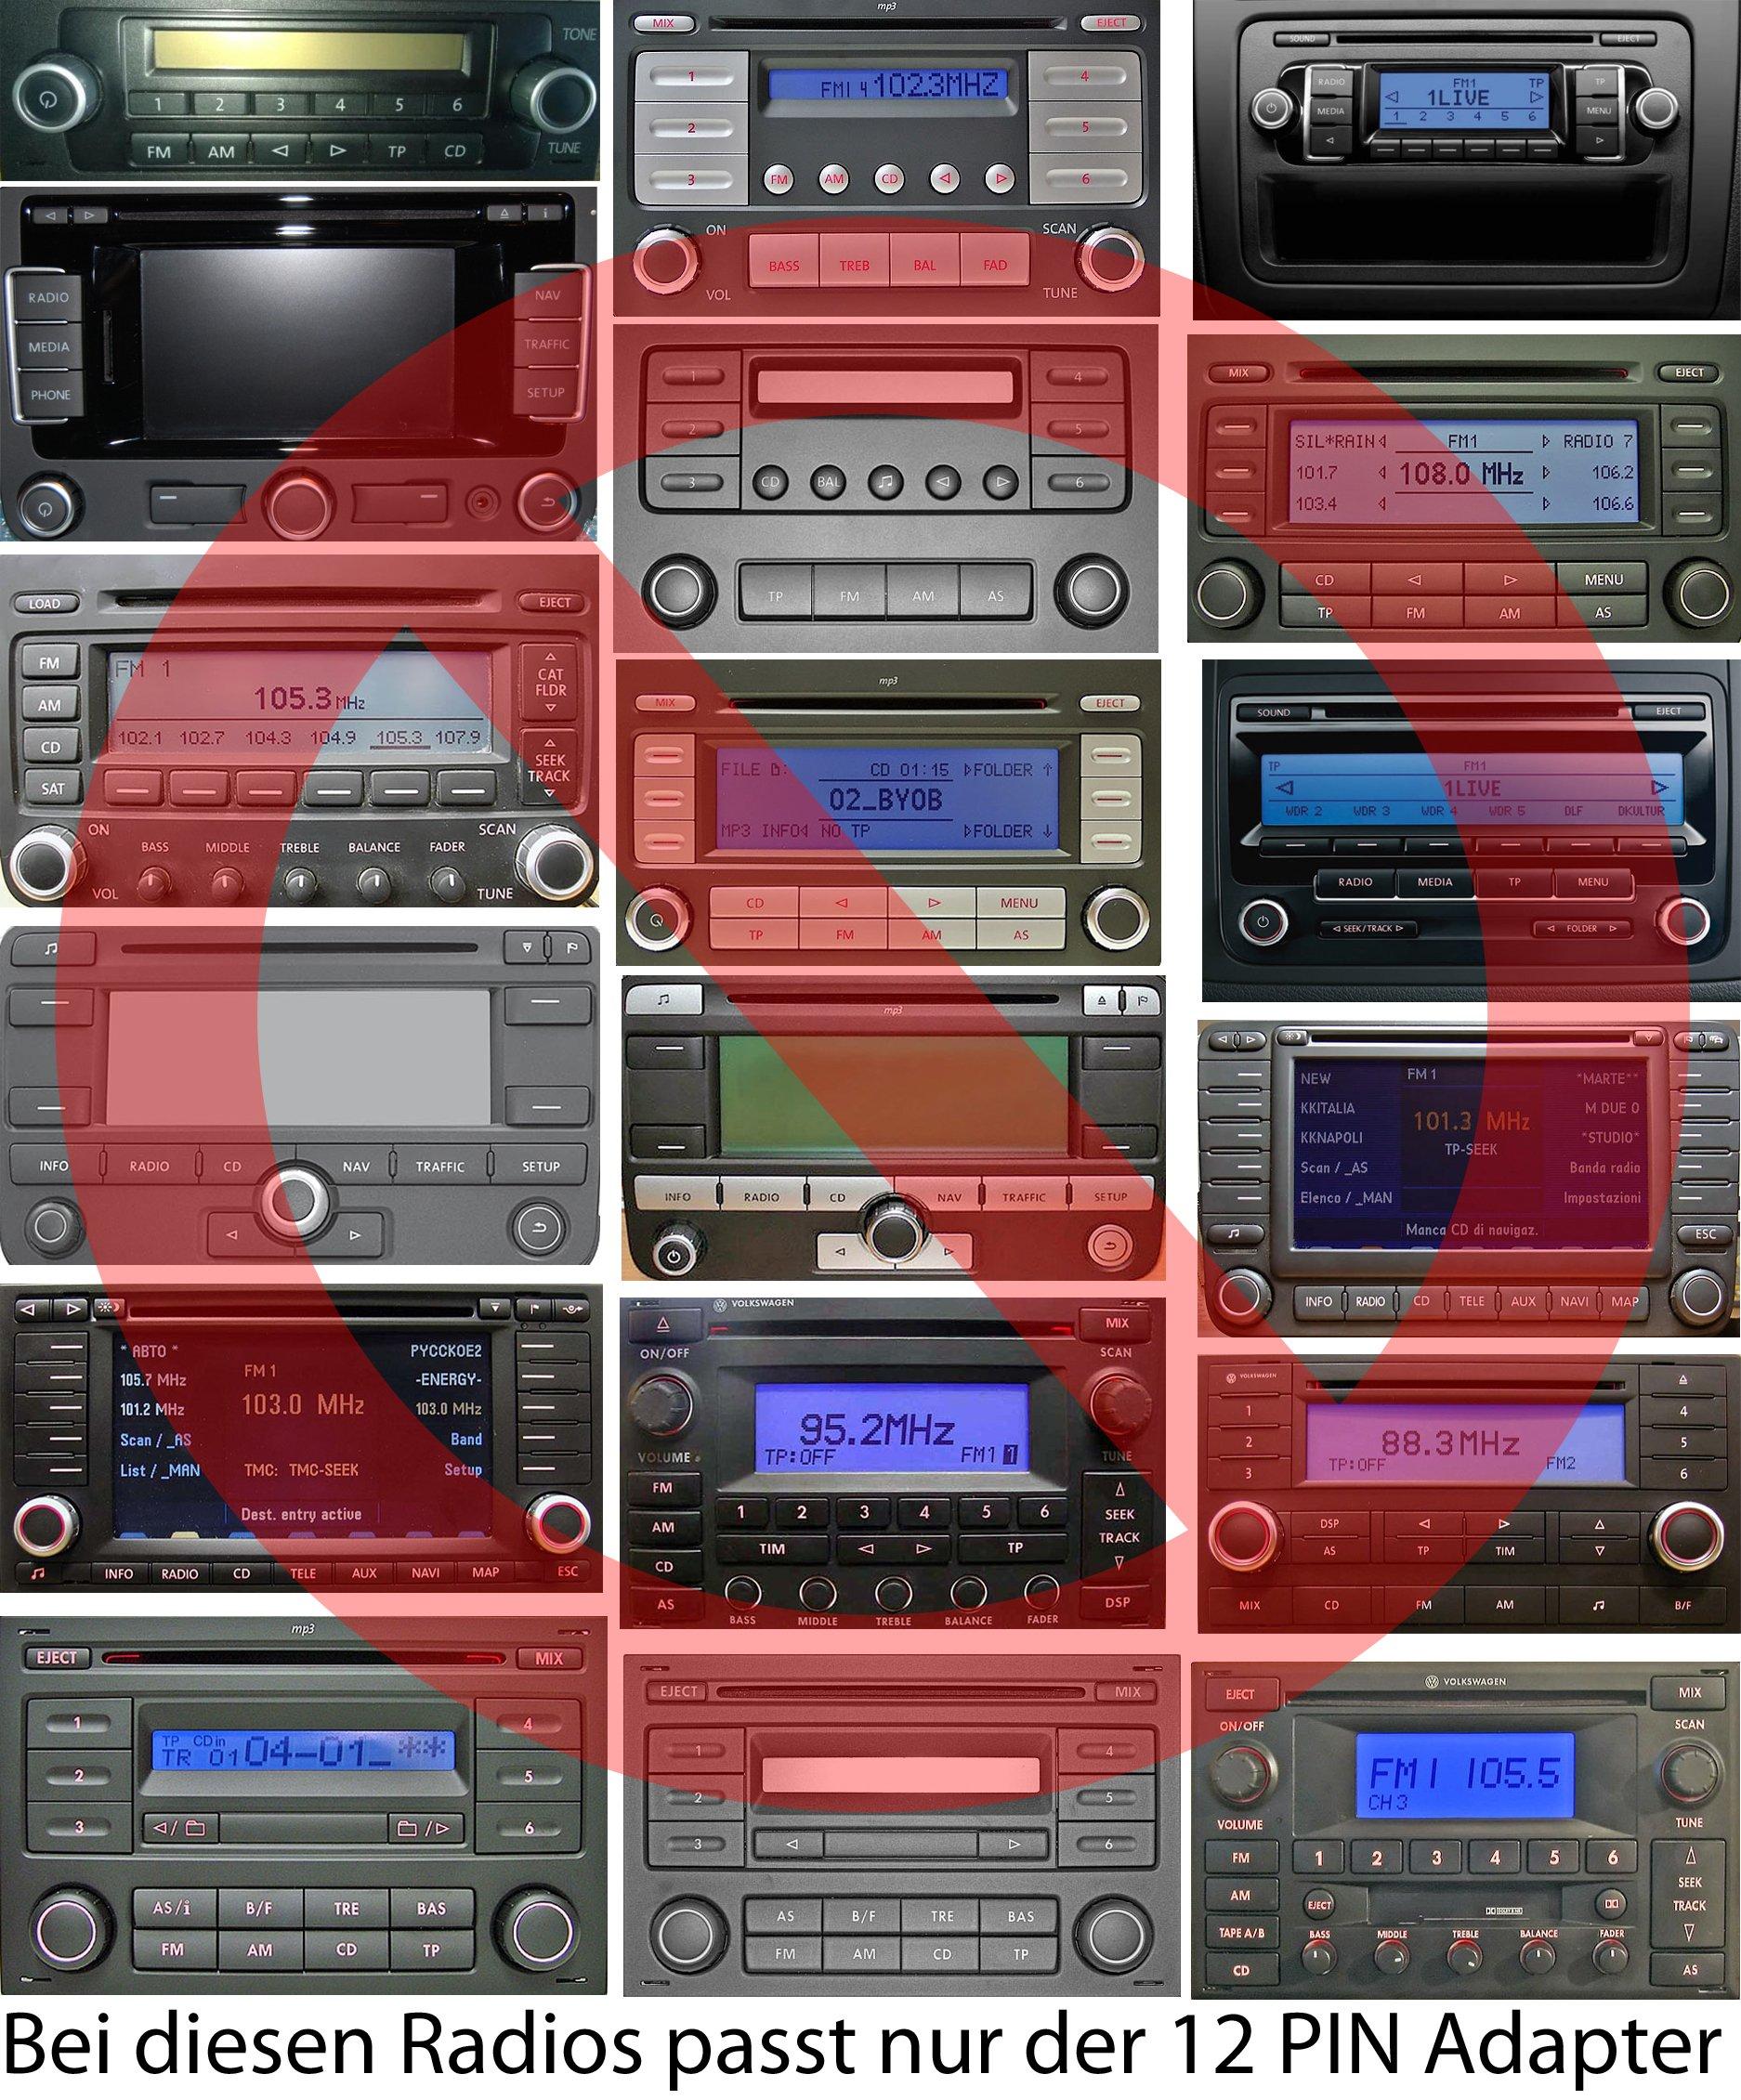 USB-SD-AUX-MP3-Adapter-Bluetooth-Freisprechanlage-fr-VW-MCD-MFD-1-MFD-DX-Alpha-Beetle-Beta-5-Premium-5-Skoda-MS-303501502-Symphony-CD-Kassette-SatCompass-Seat-Alana-Aura-CD-Beta-Elba-Lena-Liceo-Scala